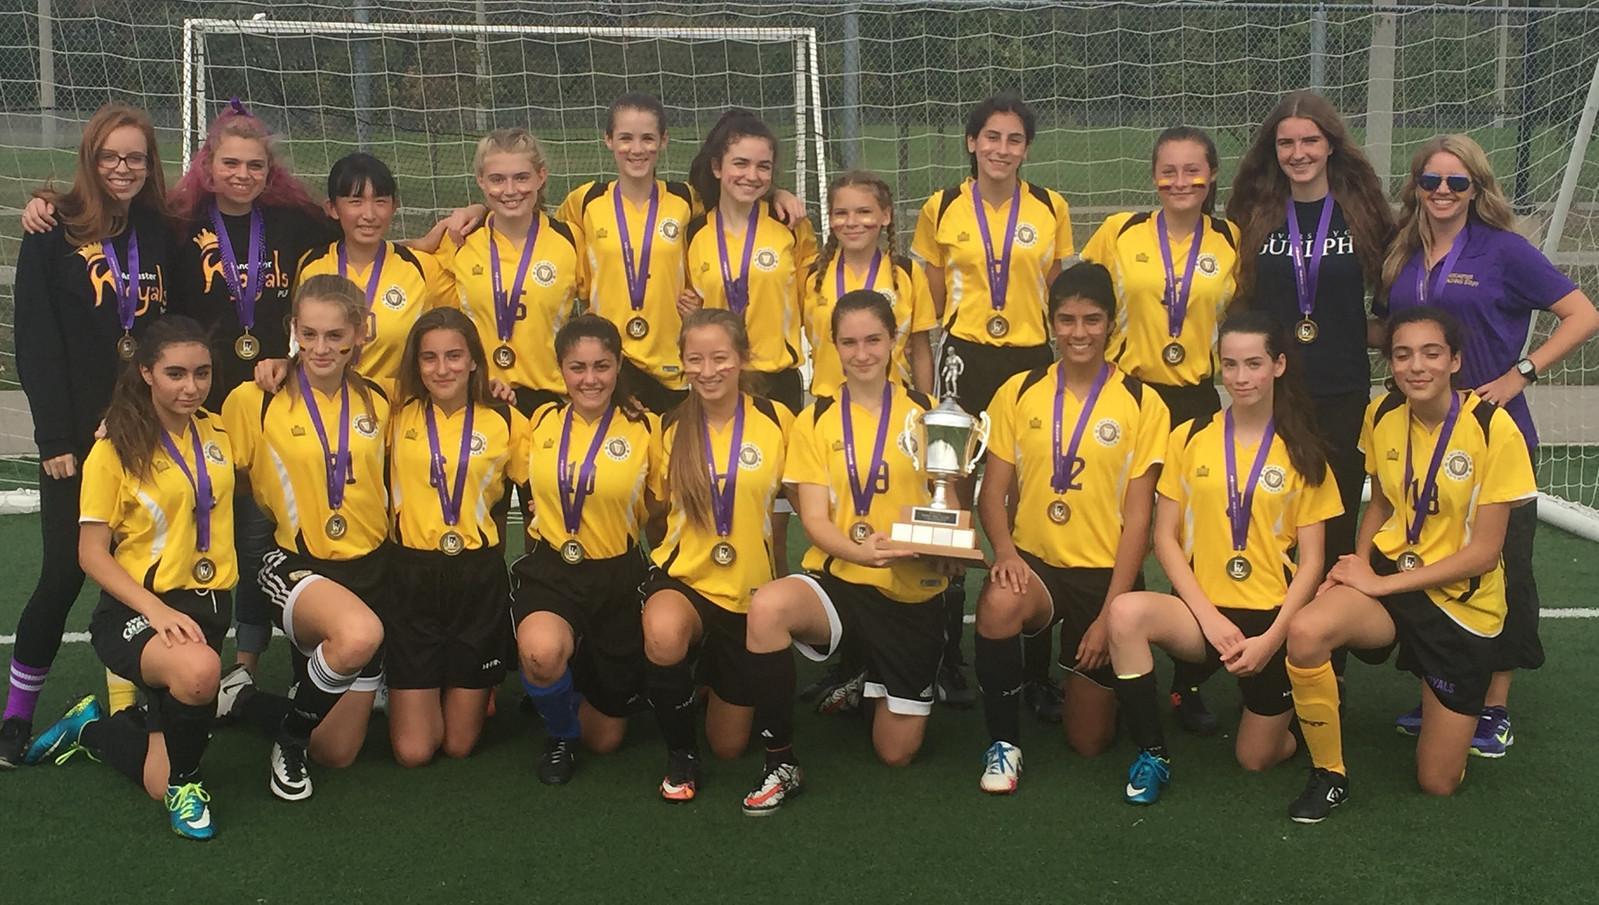 2017-18 Grade 9 Girls Soccer Champions: Ancaster Royals